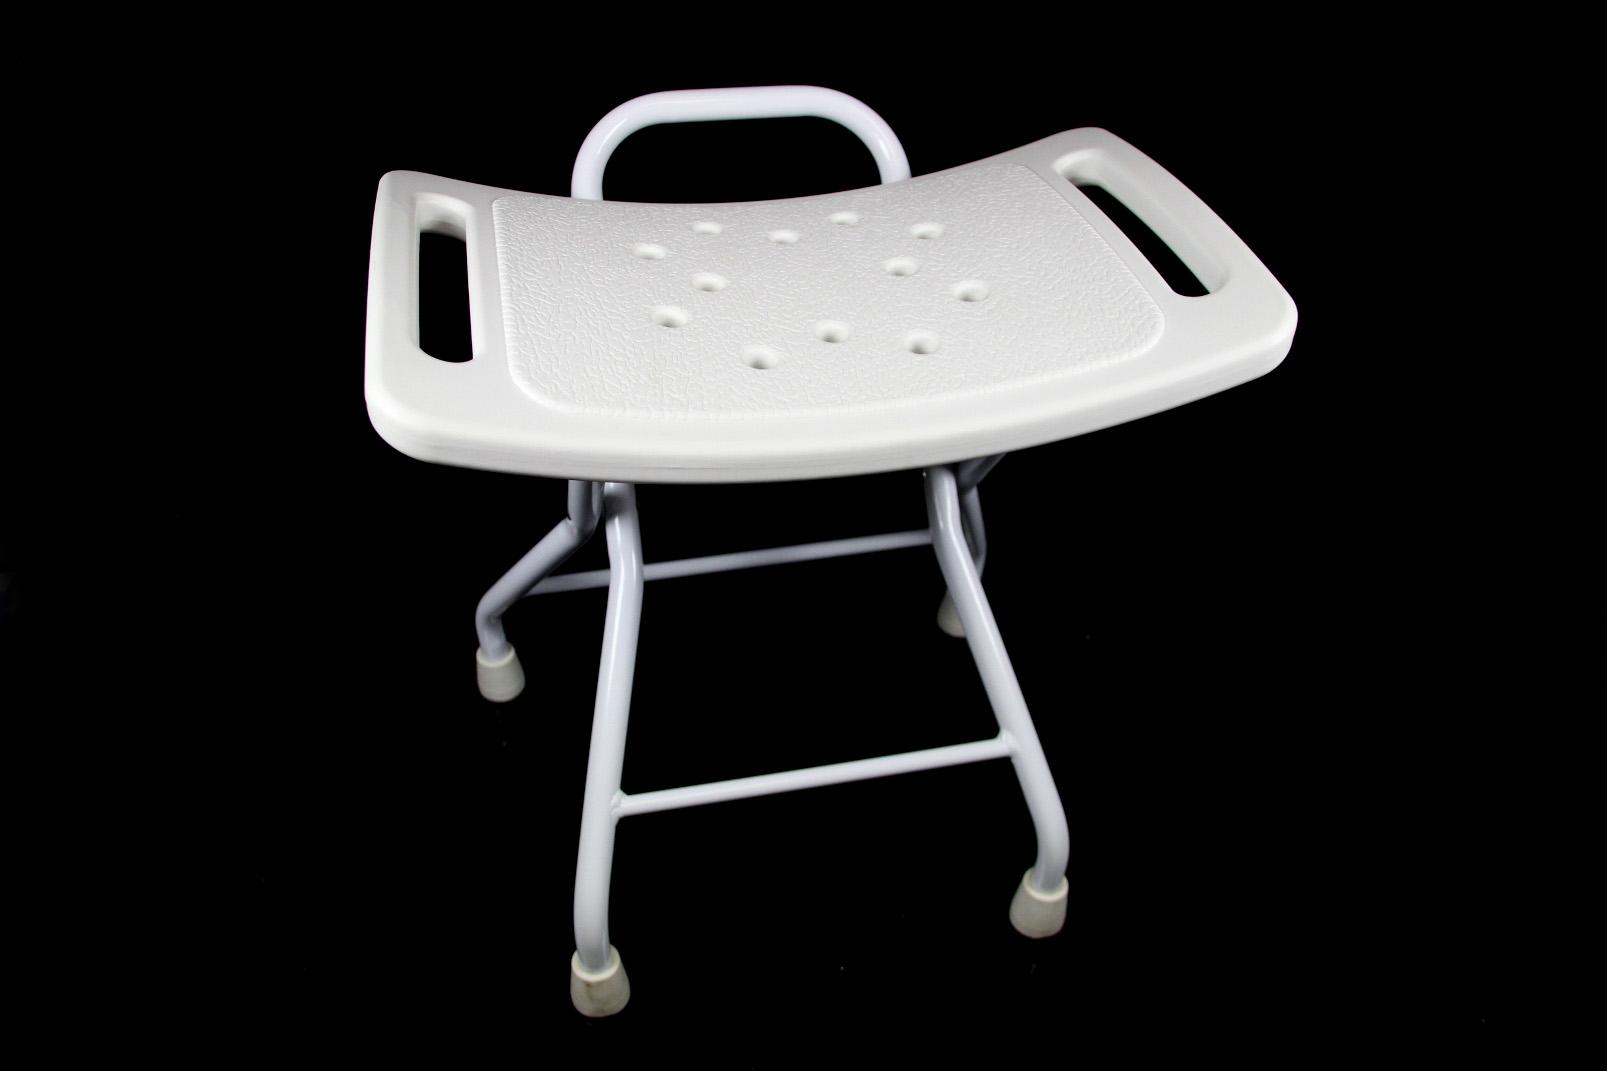 klappbarer duschhocker duschhilfe metall kunststoff wei dusch stuhl bad hocker ebay. Black Bedroom Furniture Sets. Home Design Ideas